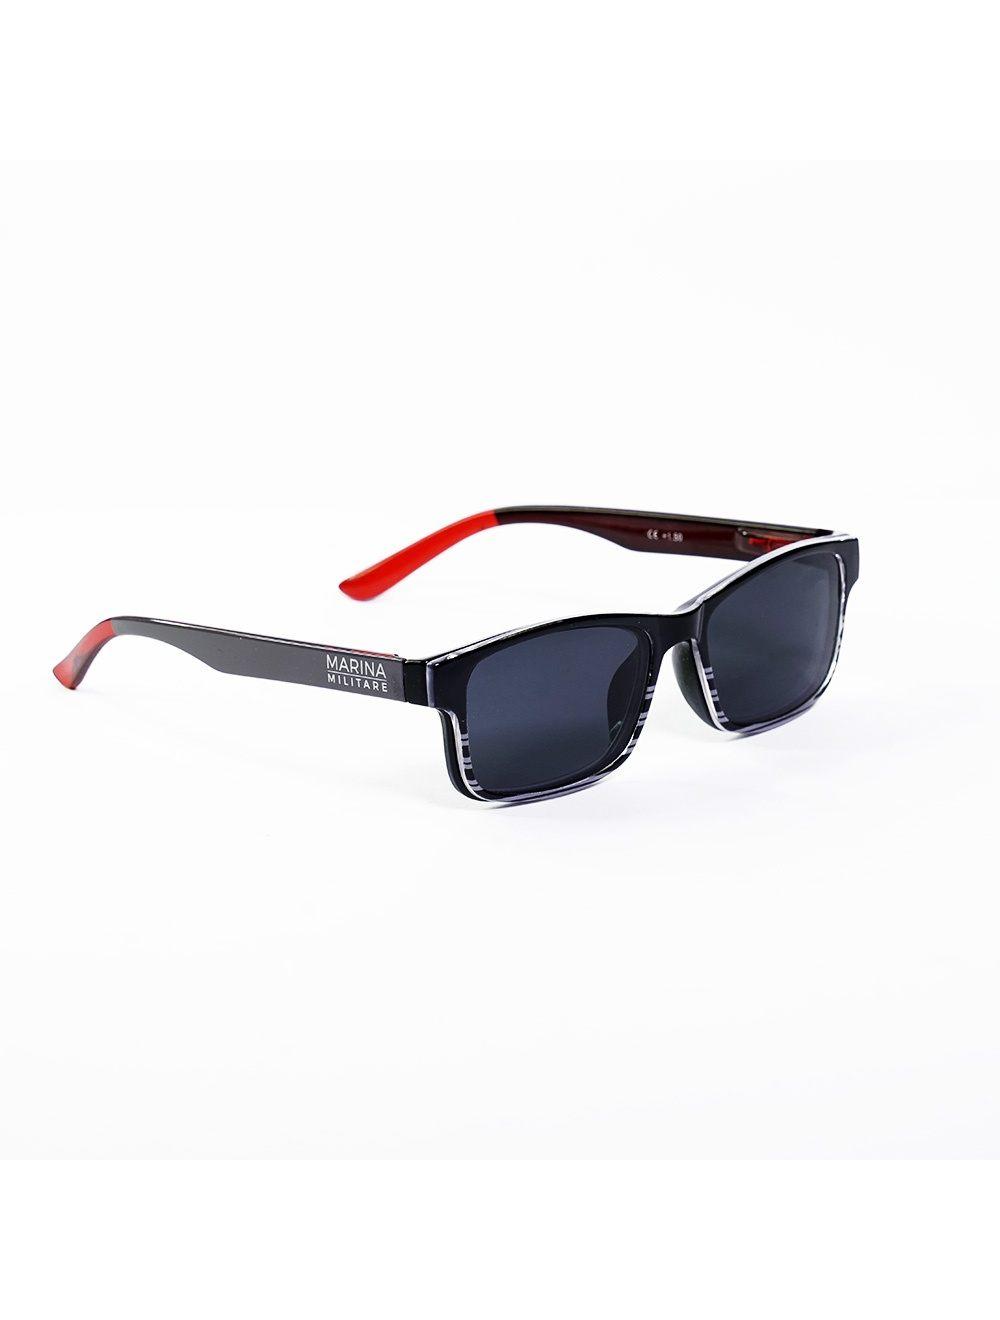 Reading Sunglasses 1,5 Marina Militare - Black